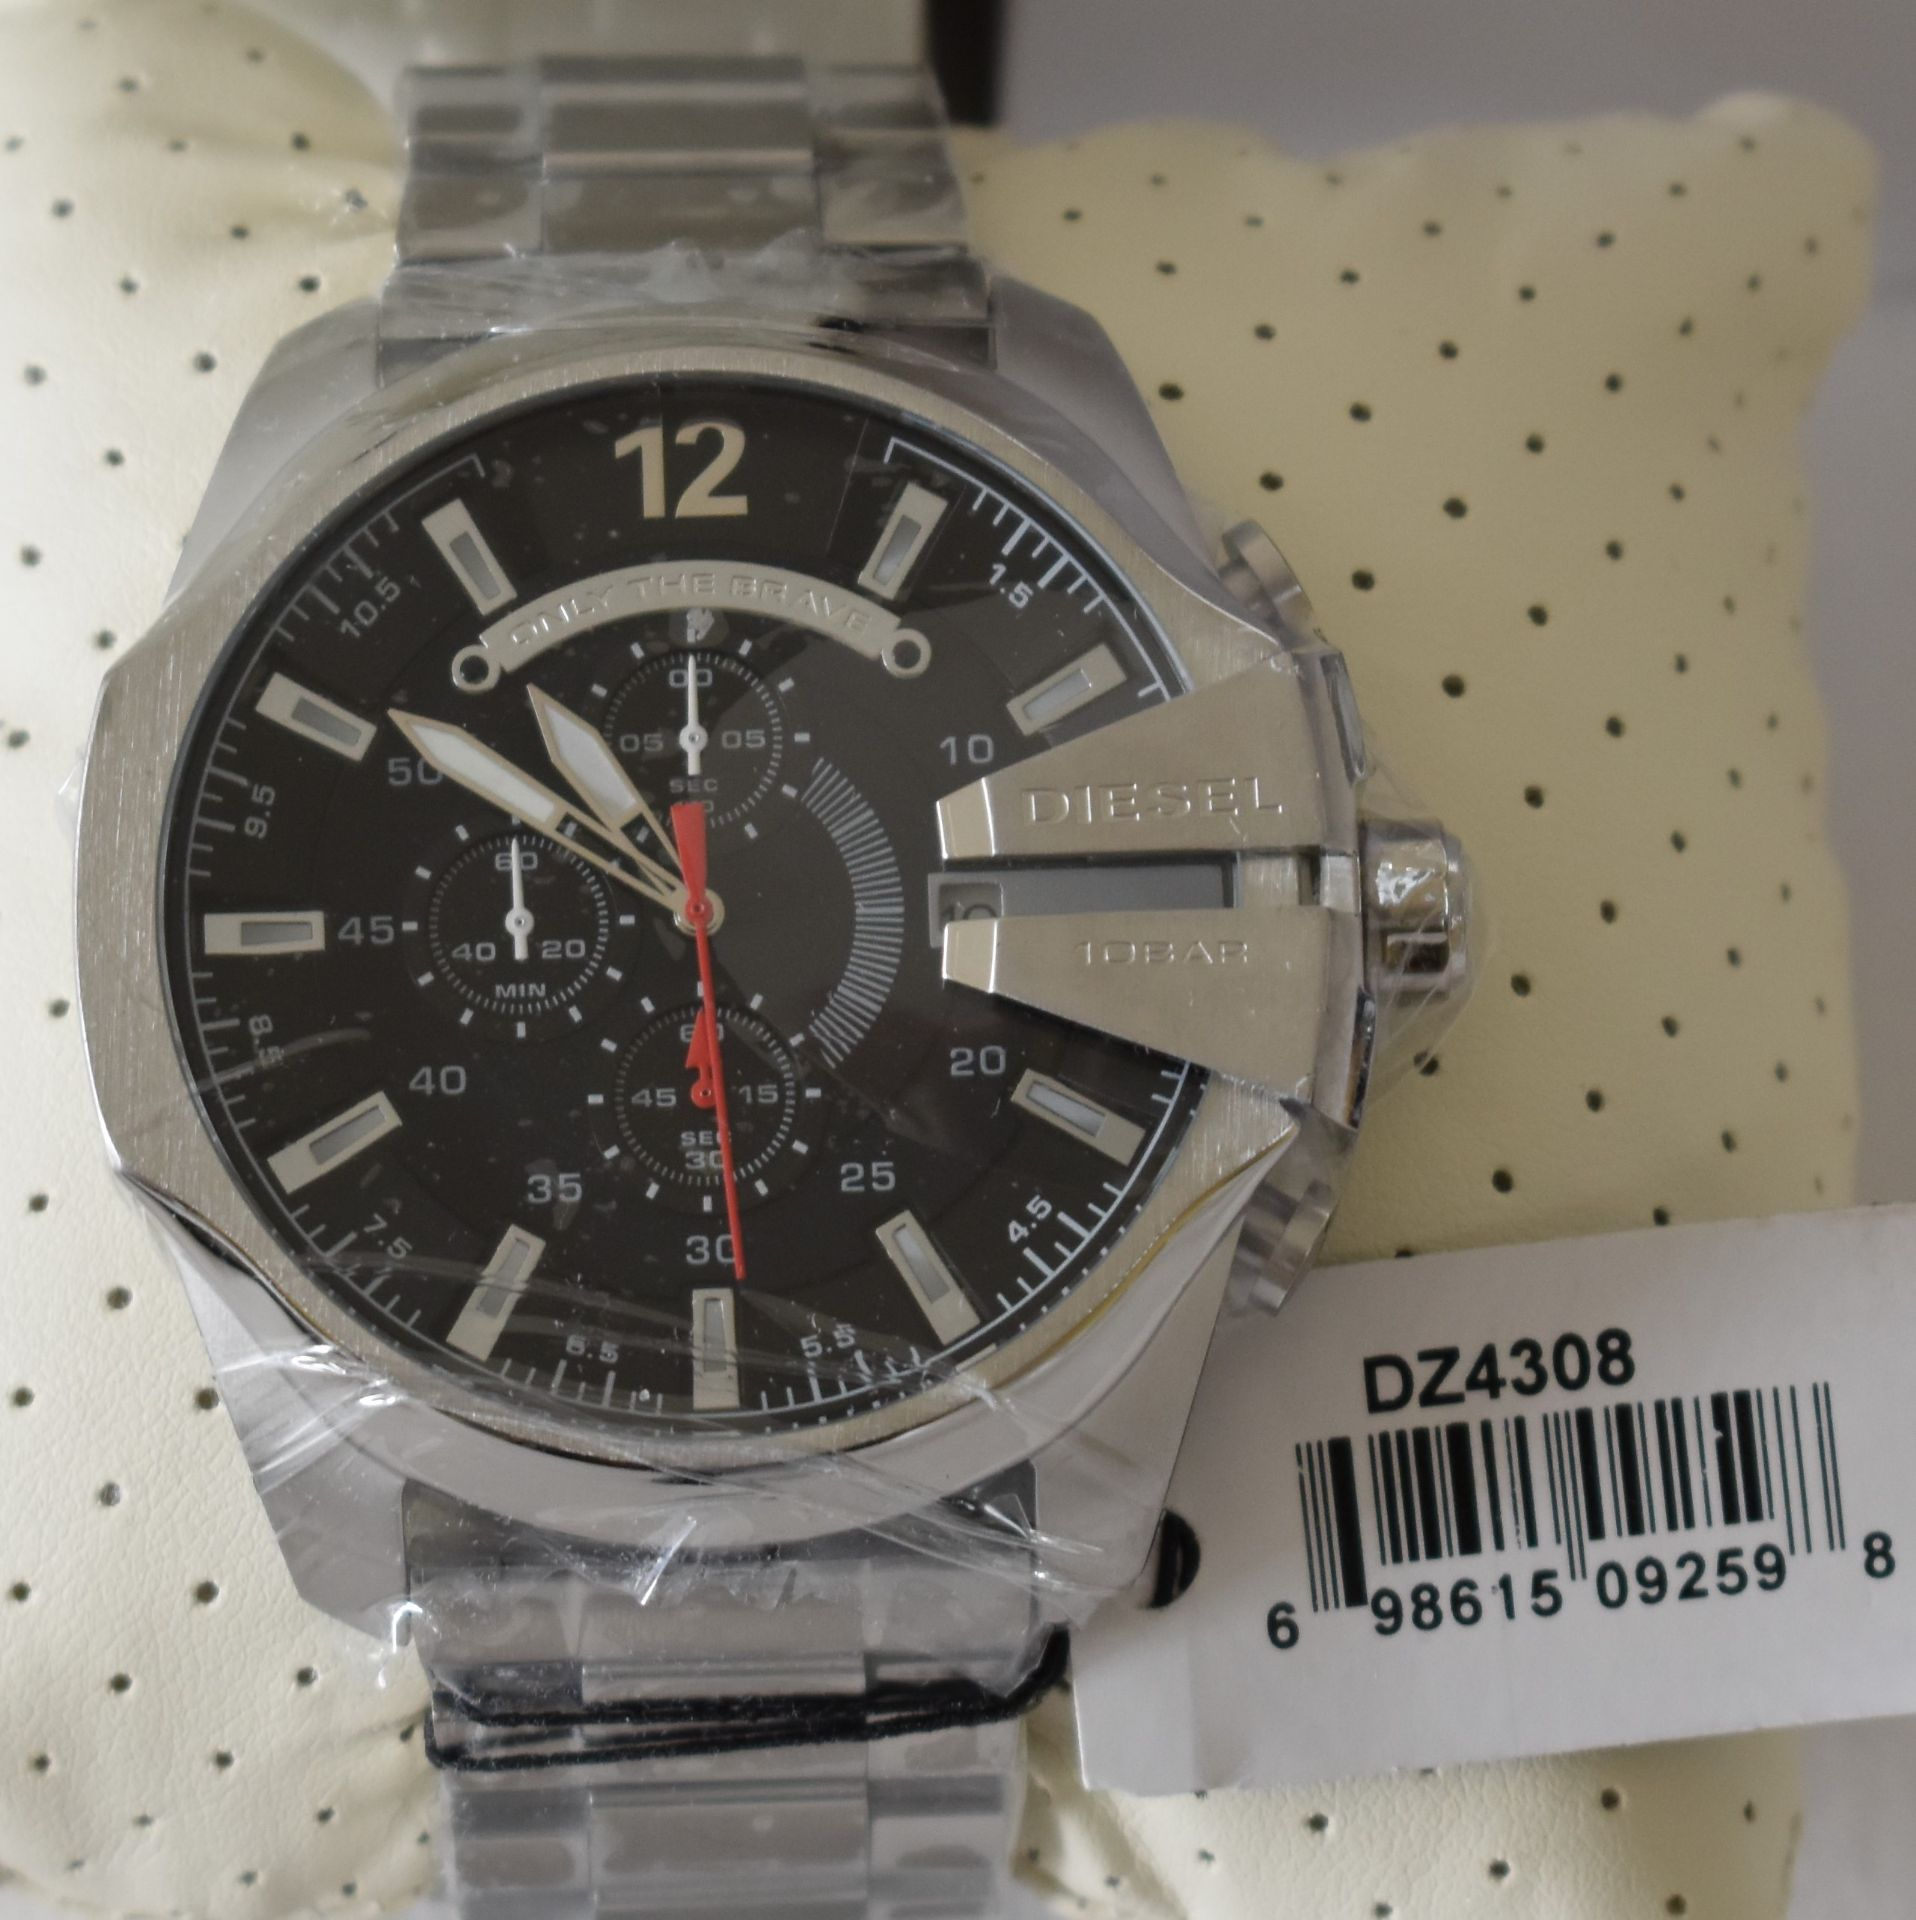 Diesel Men's Watch DZ4308 - Image 2 of 2